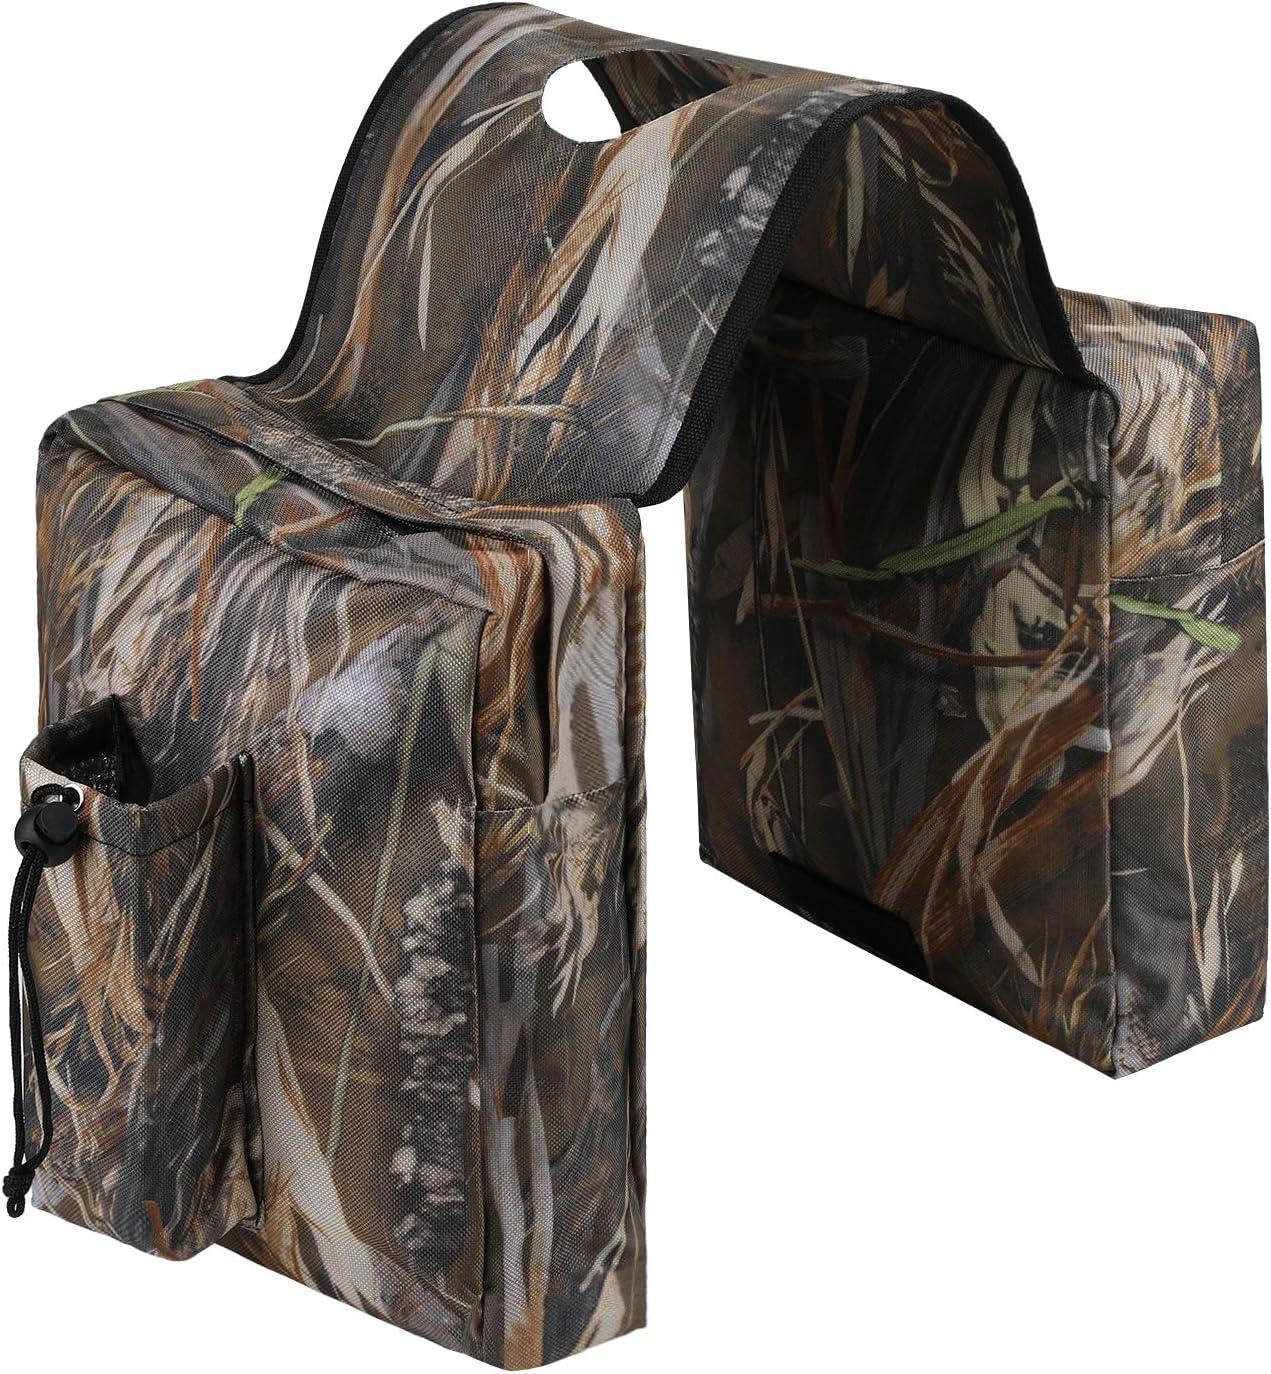 Wilove ATV Cargo Pocket Saddle Bag